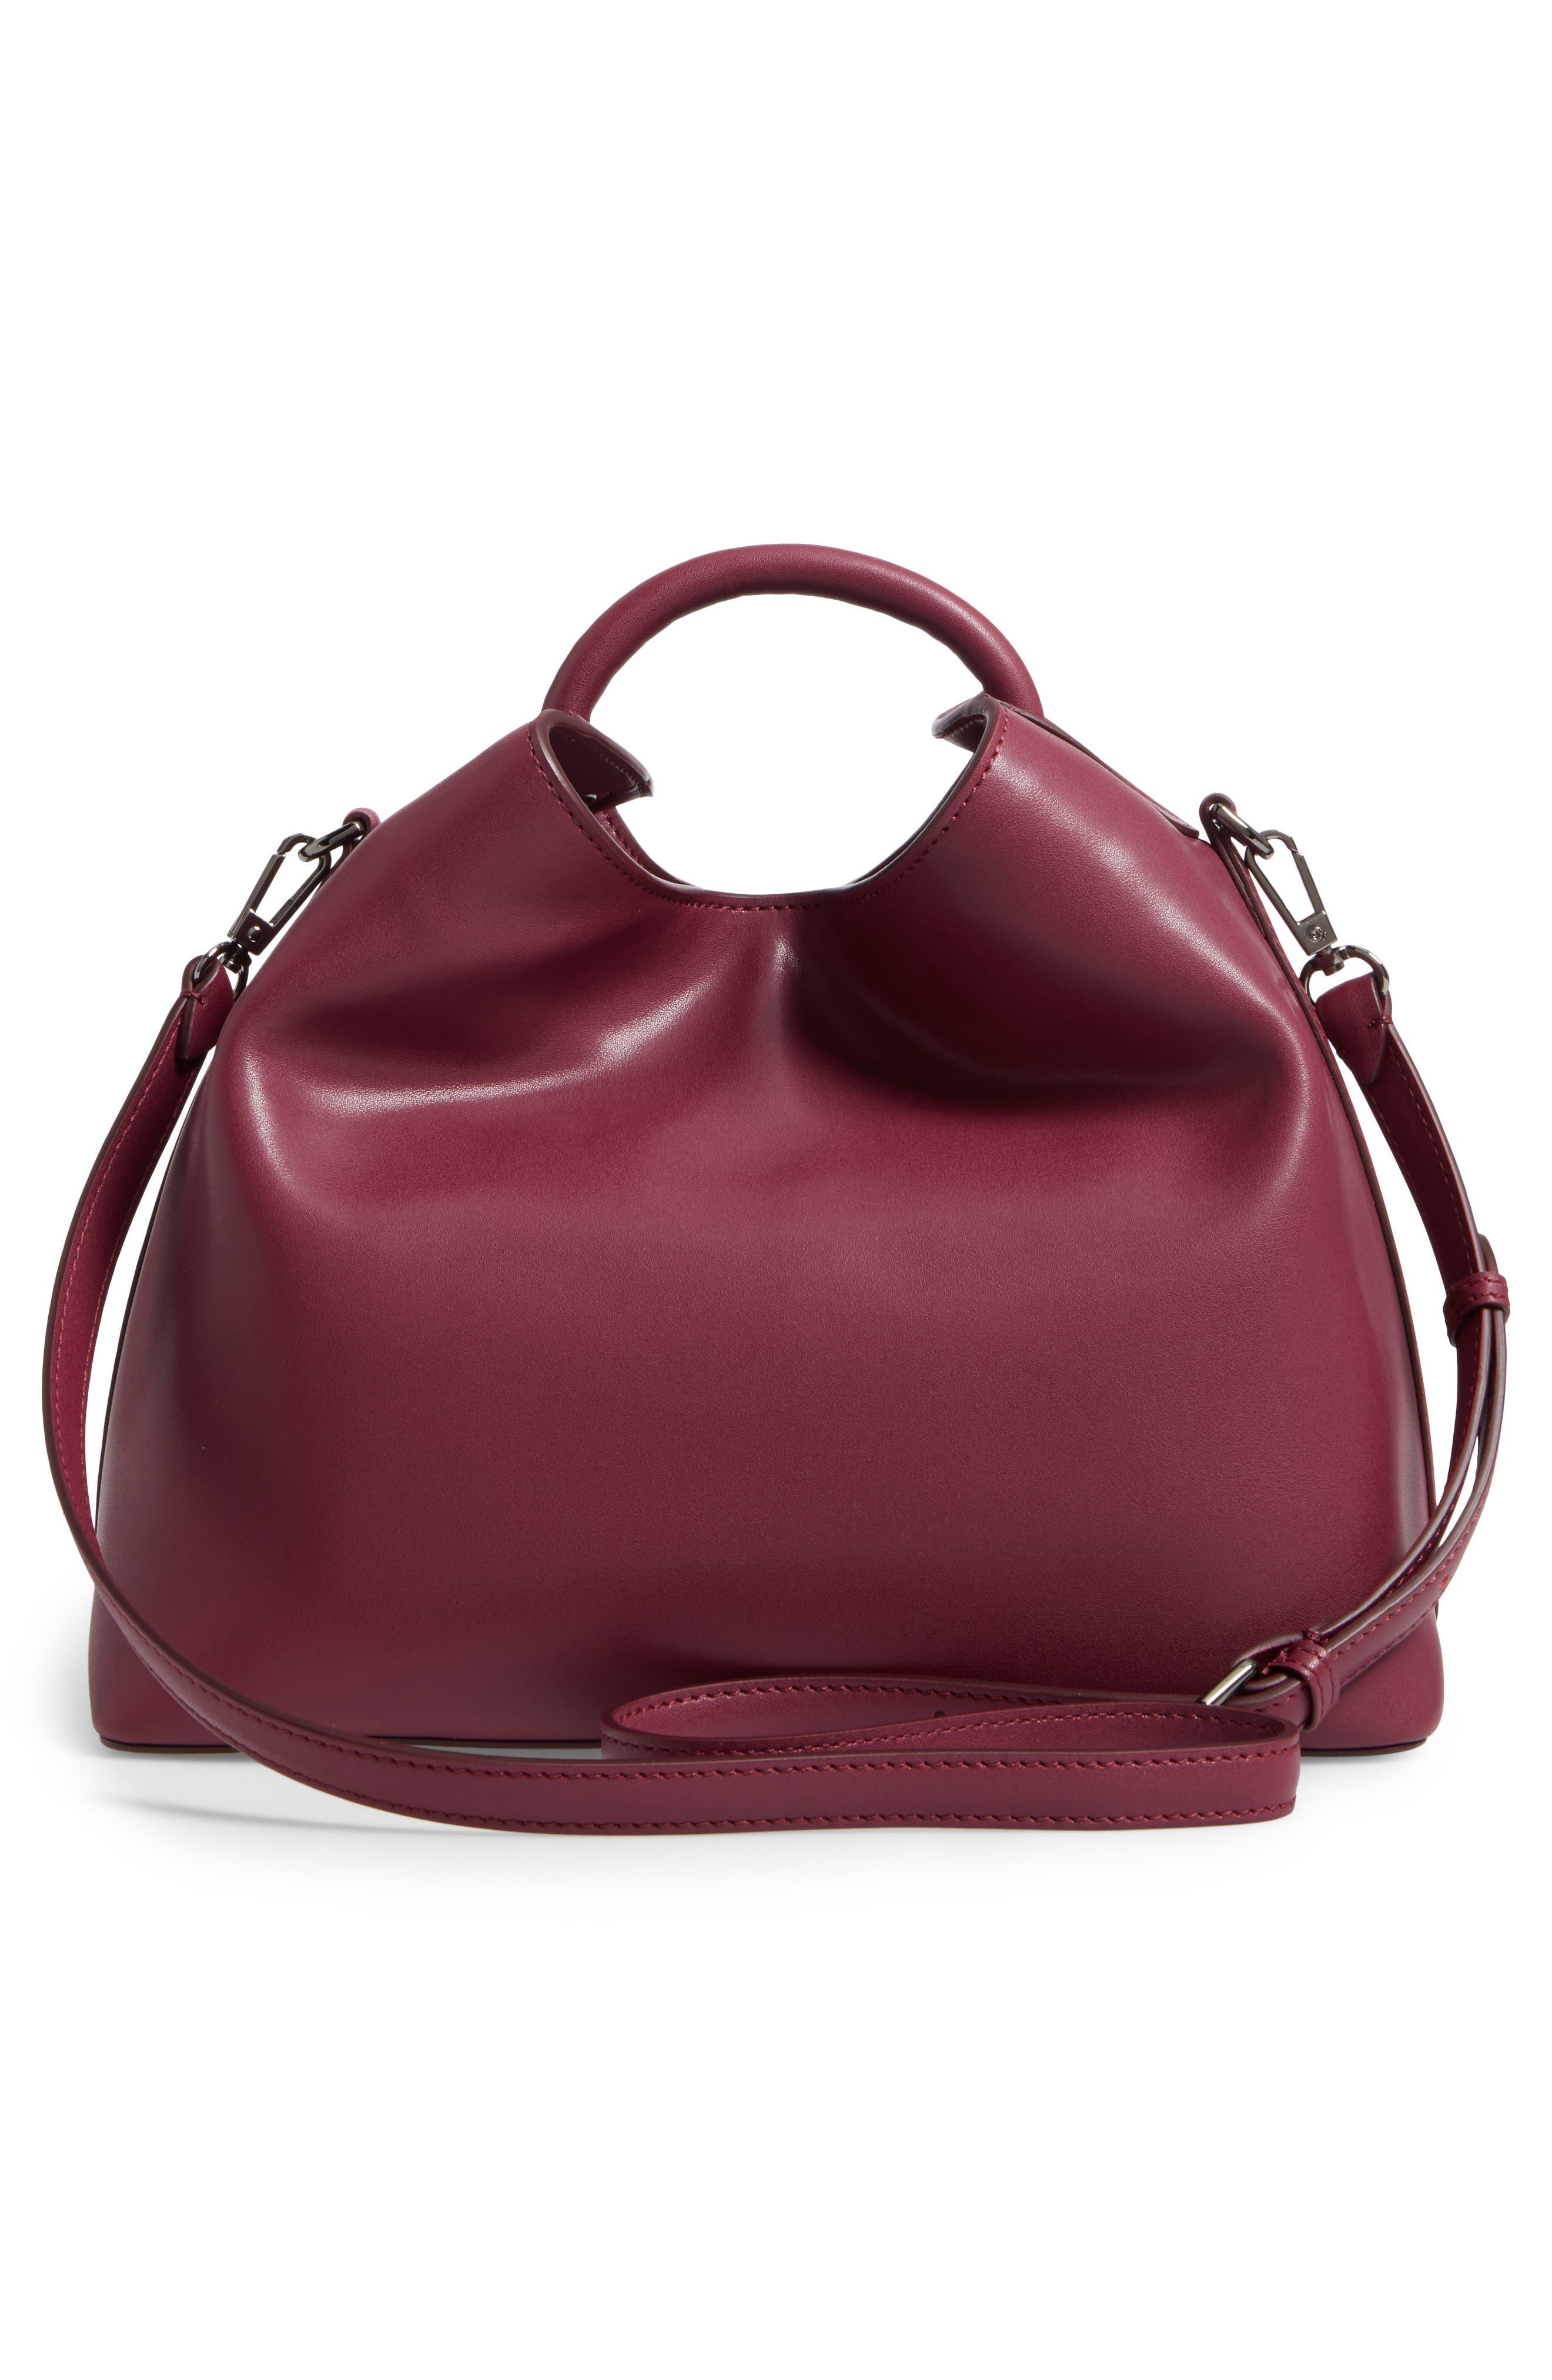 Raisin Leather Handbag,                             Alternate thumbnail 24, color,